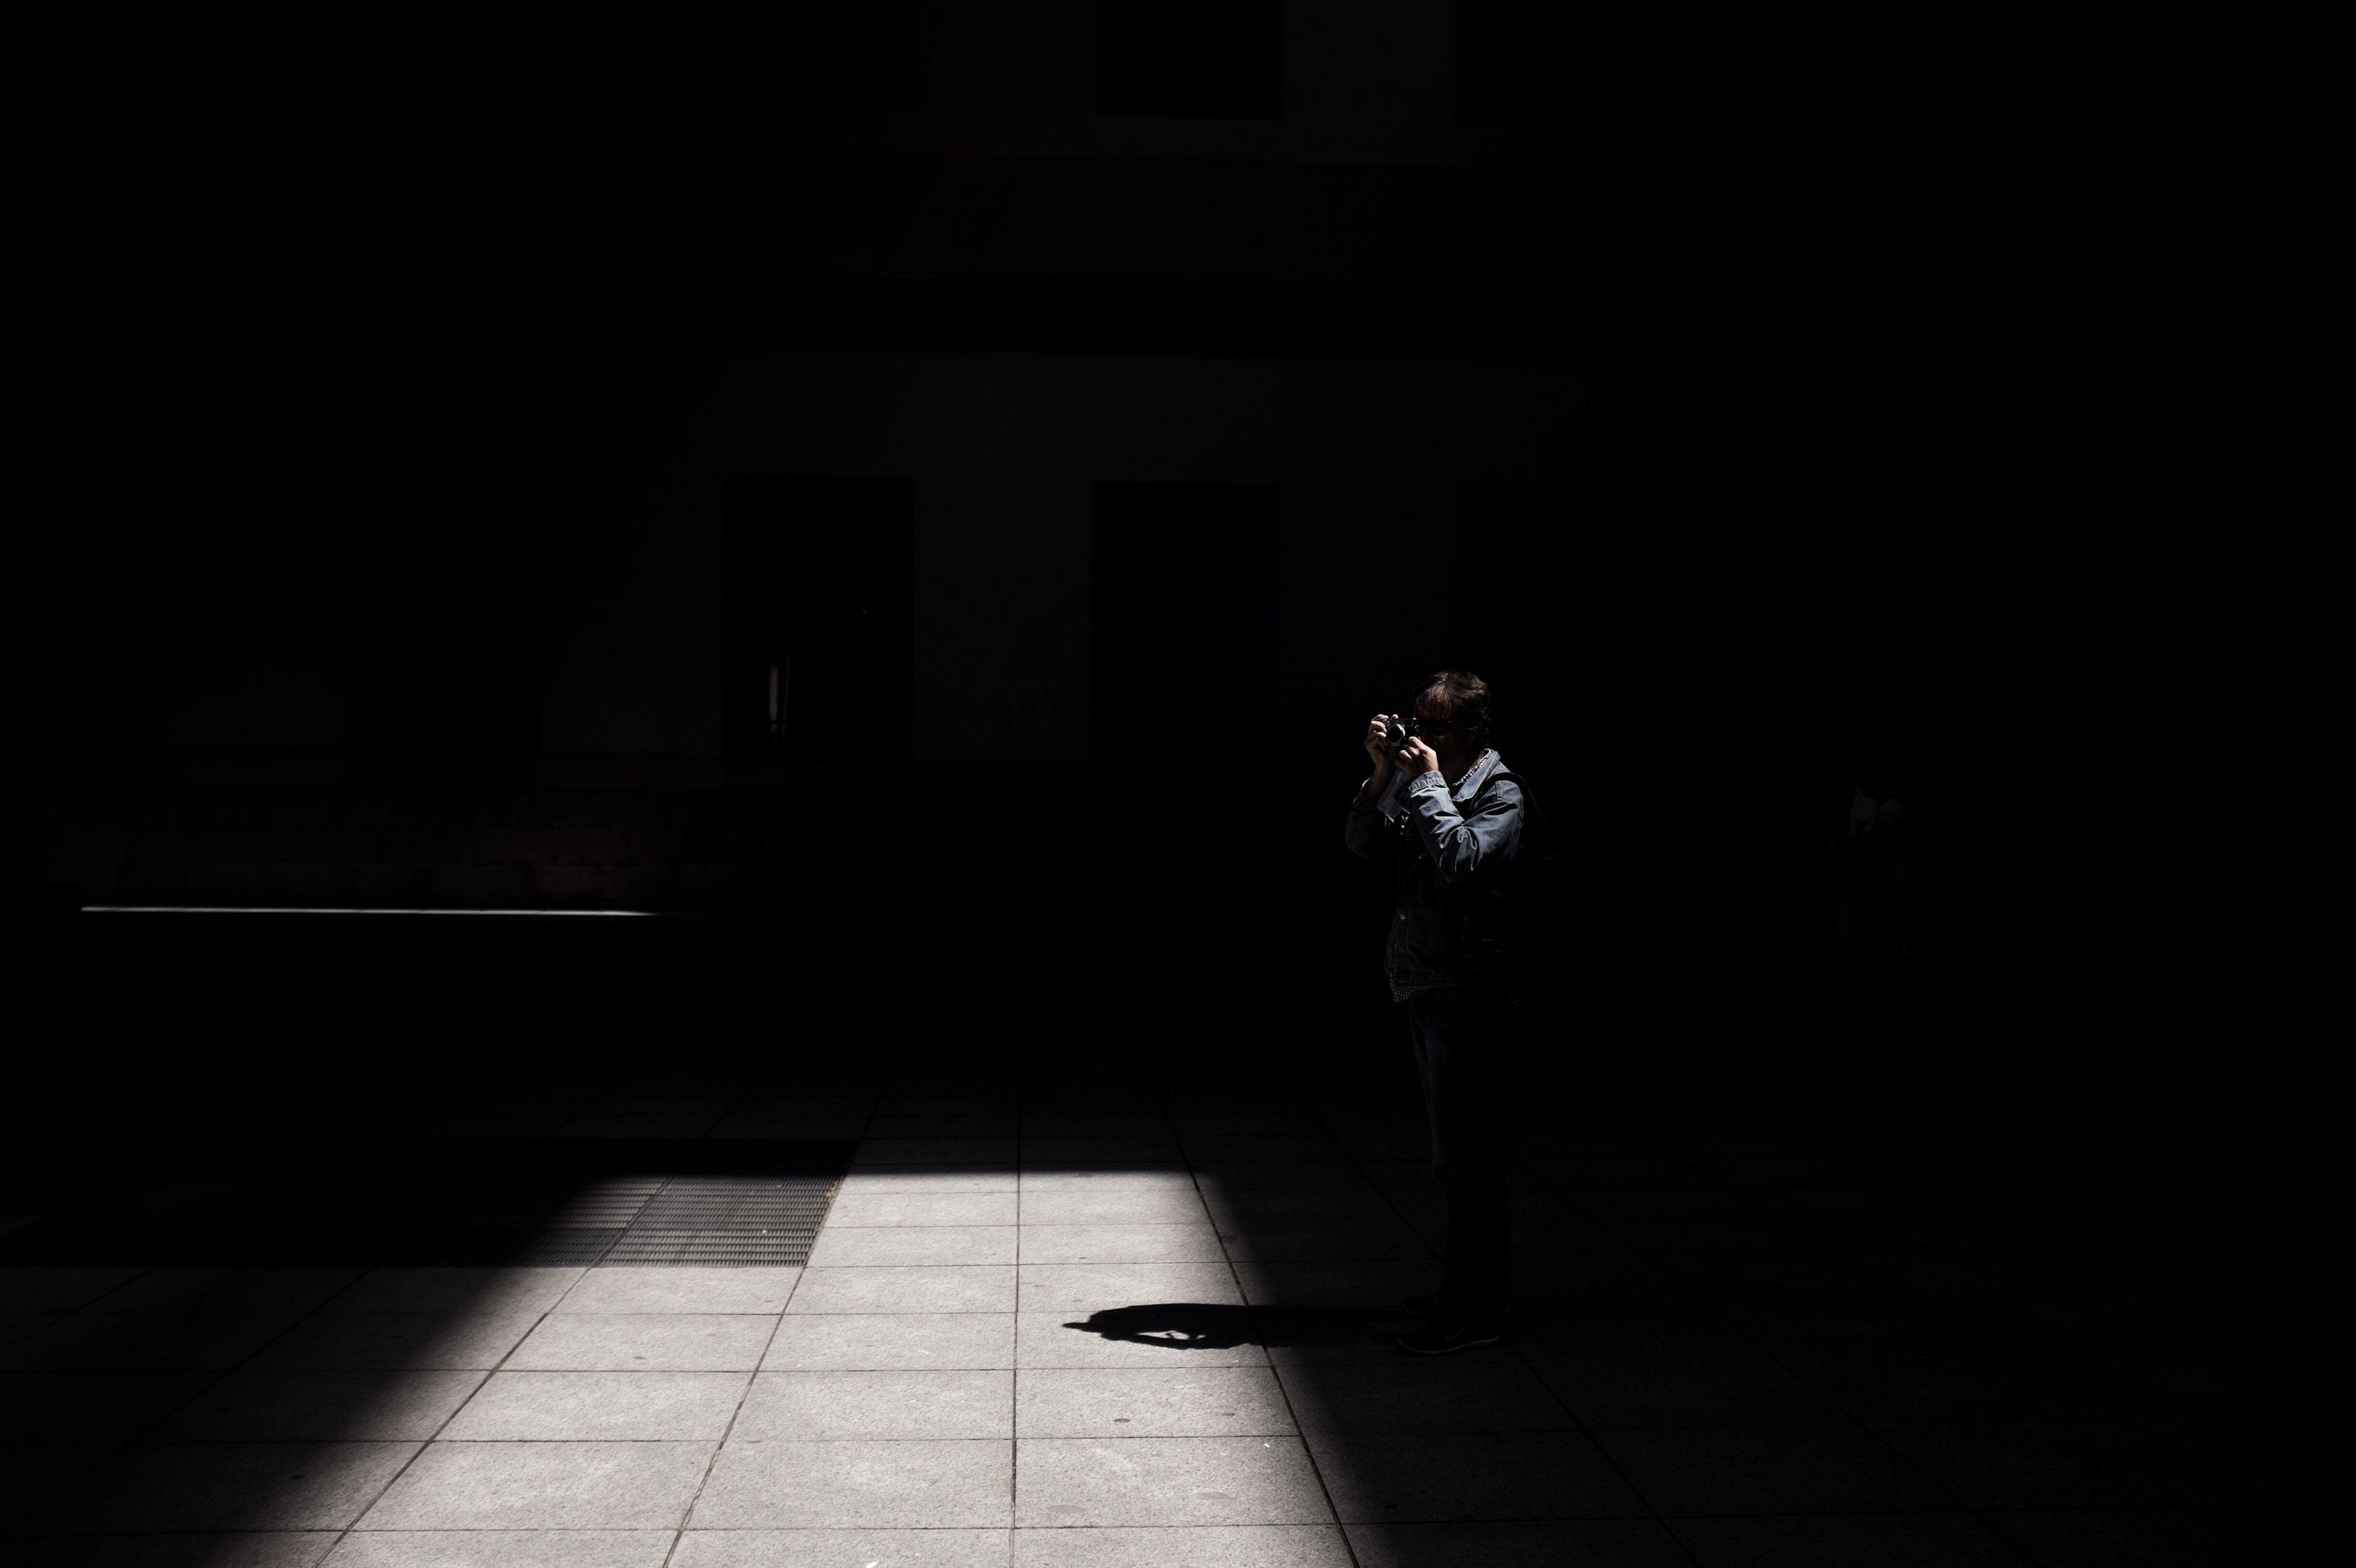 indoors, shadow, sunlight, tiled floor, built structure, architecture, flooring, night, dark, silhouette, illuminated, empty, walkway, corridor, floor, no people, wall - building feature, the way forward, footpath